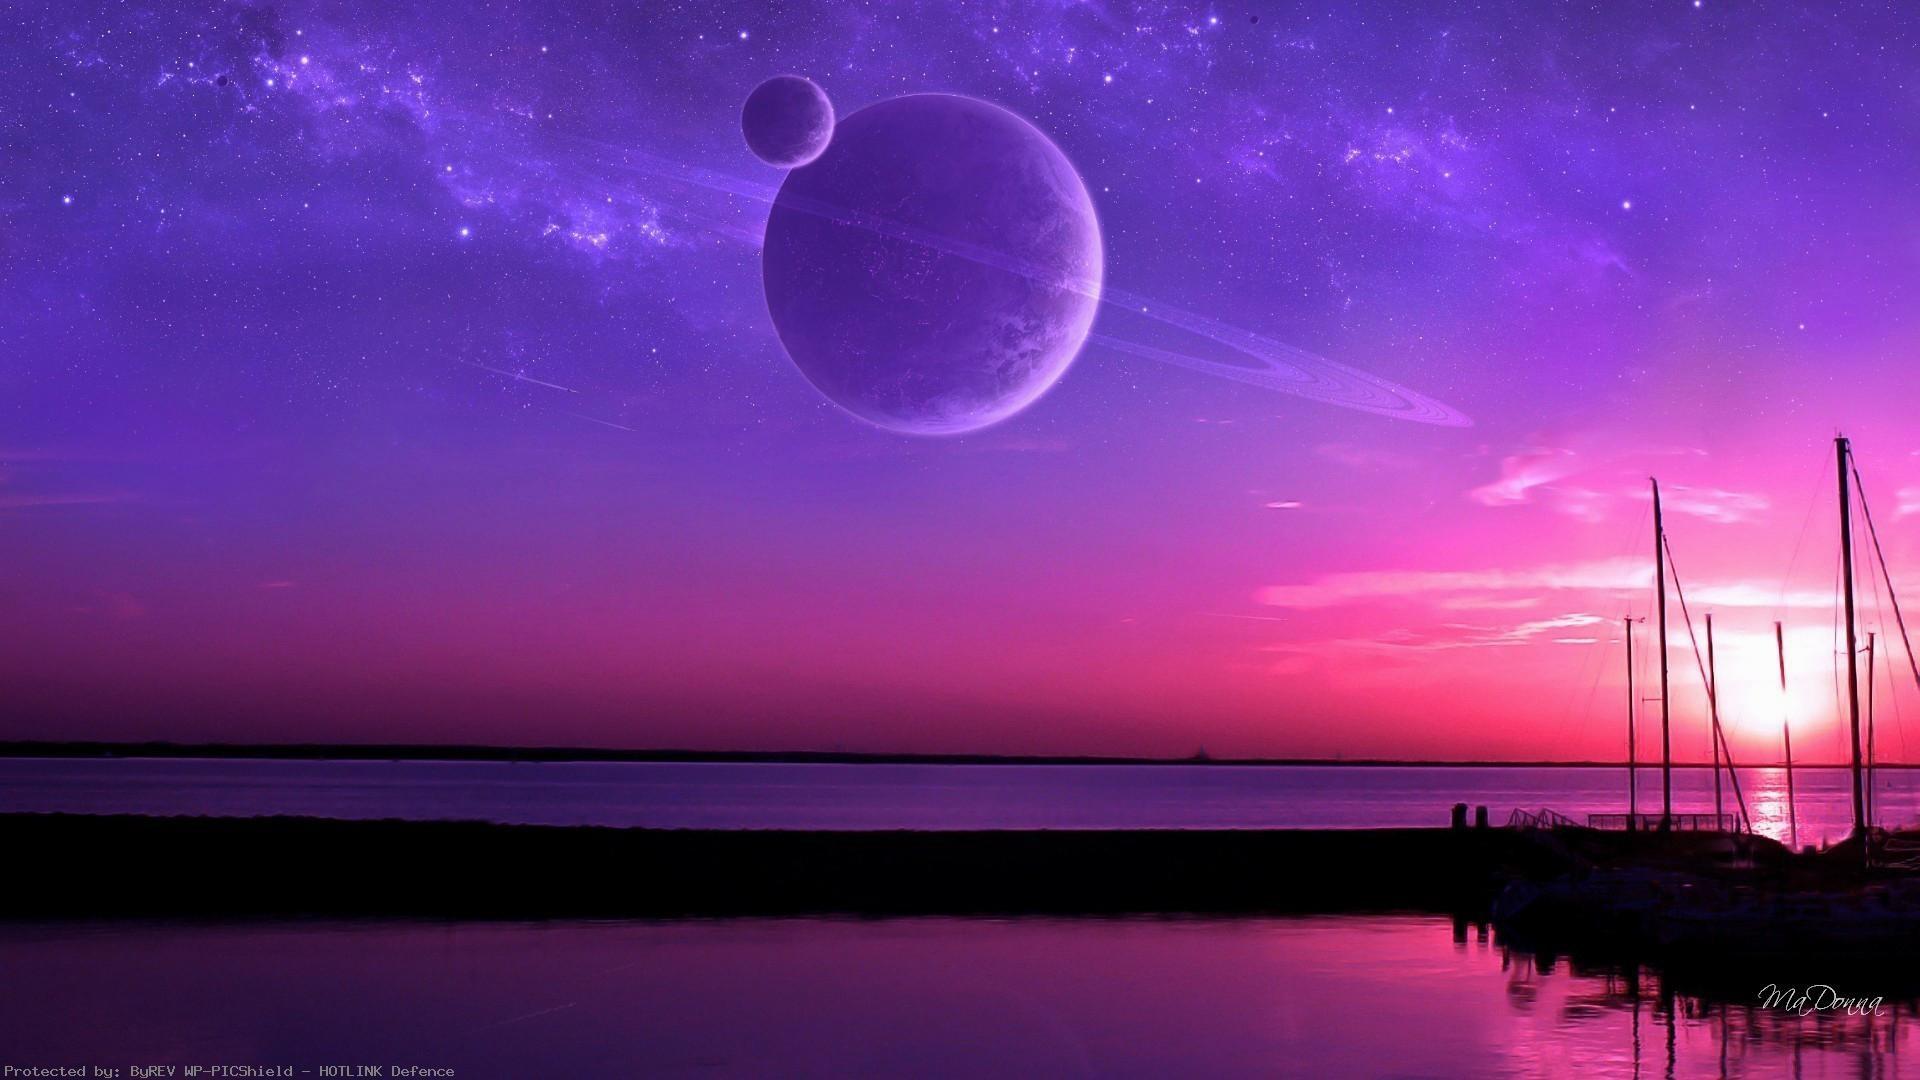 sky-beautiful-lavender-evening-sunset-water-pink-sun-